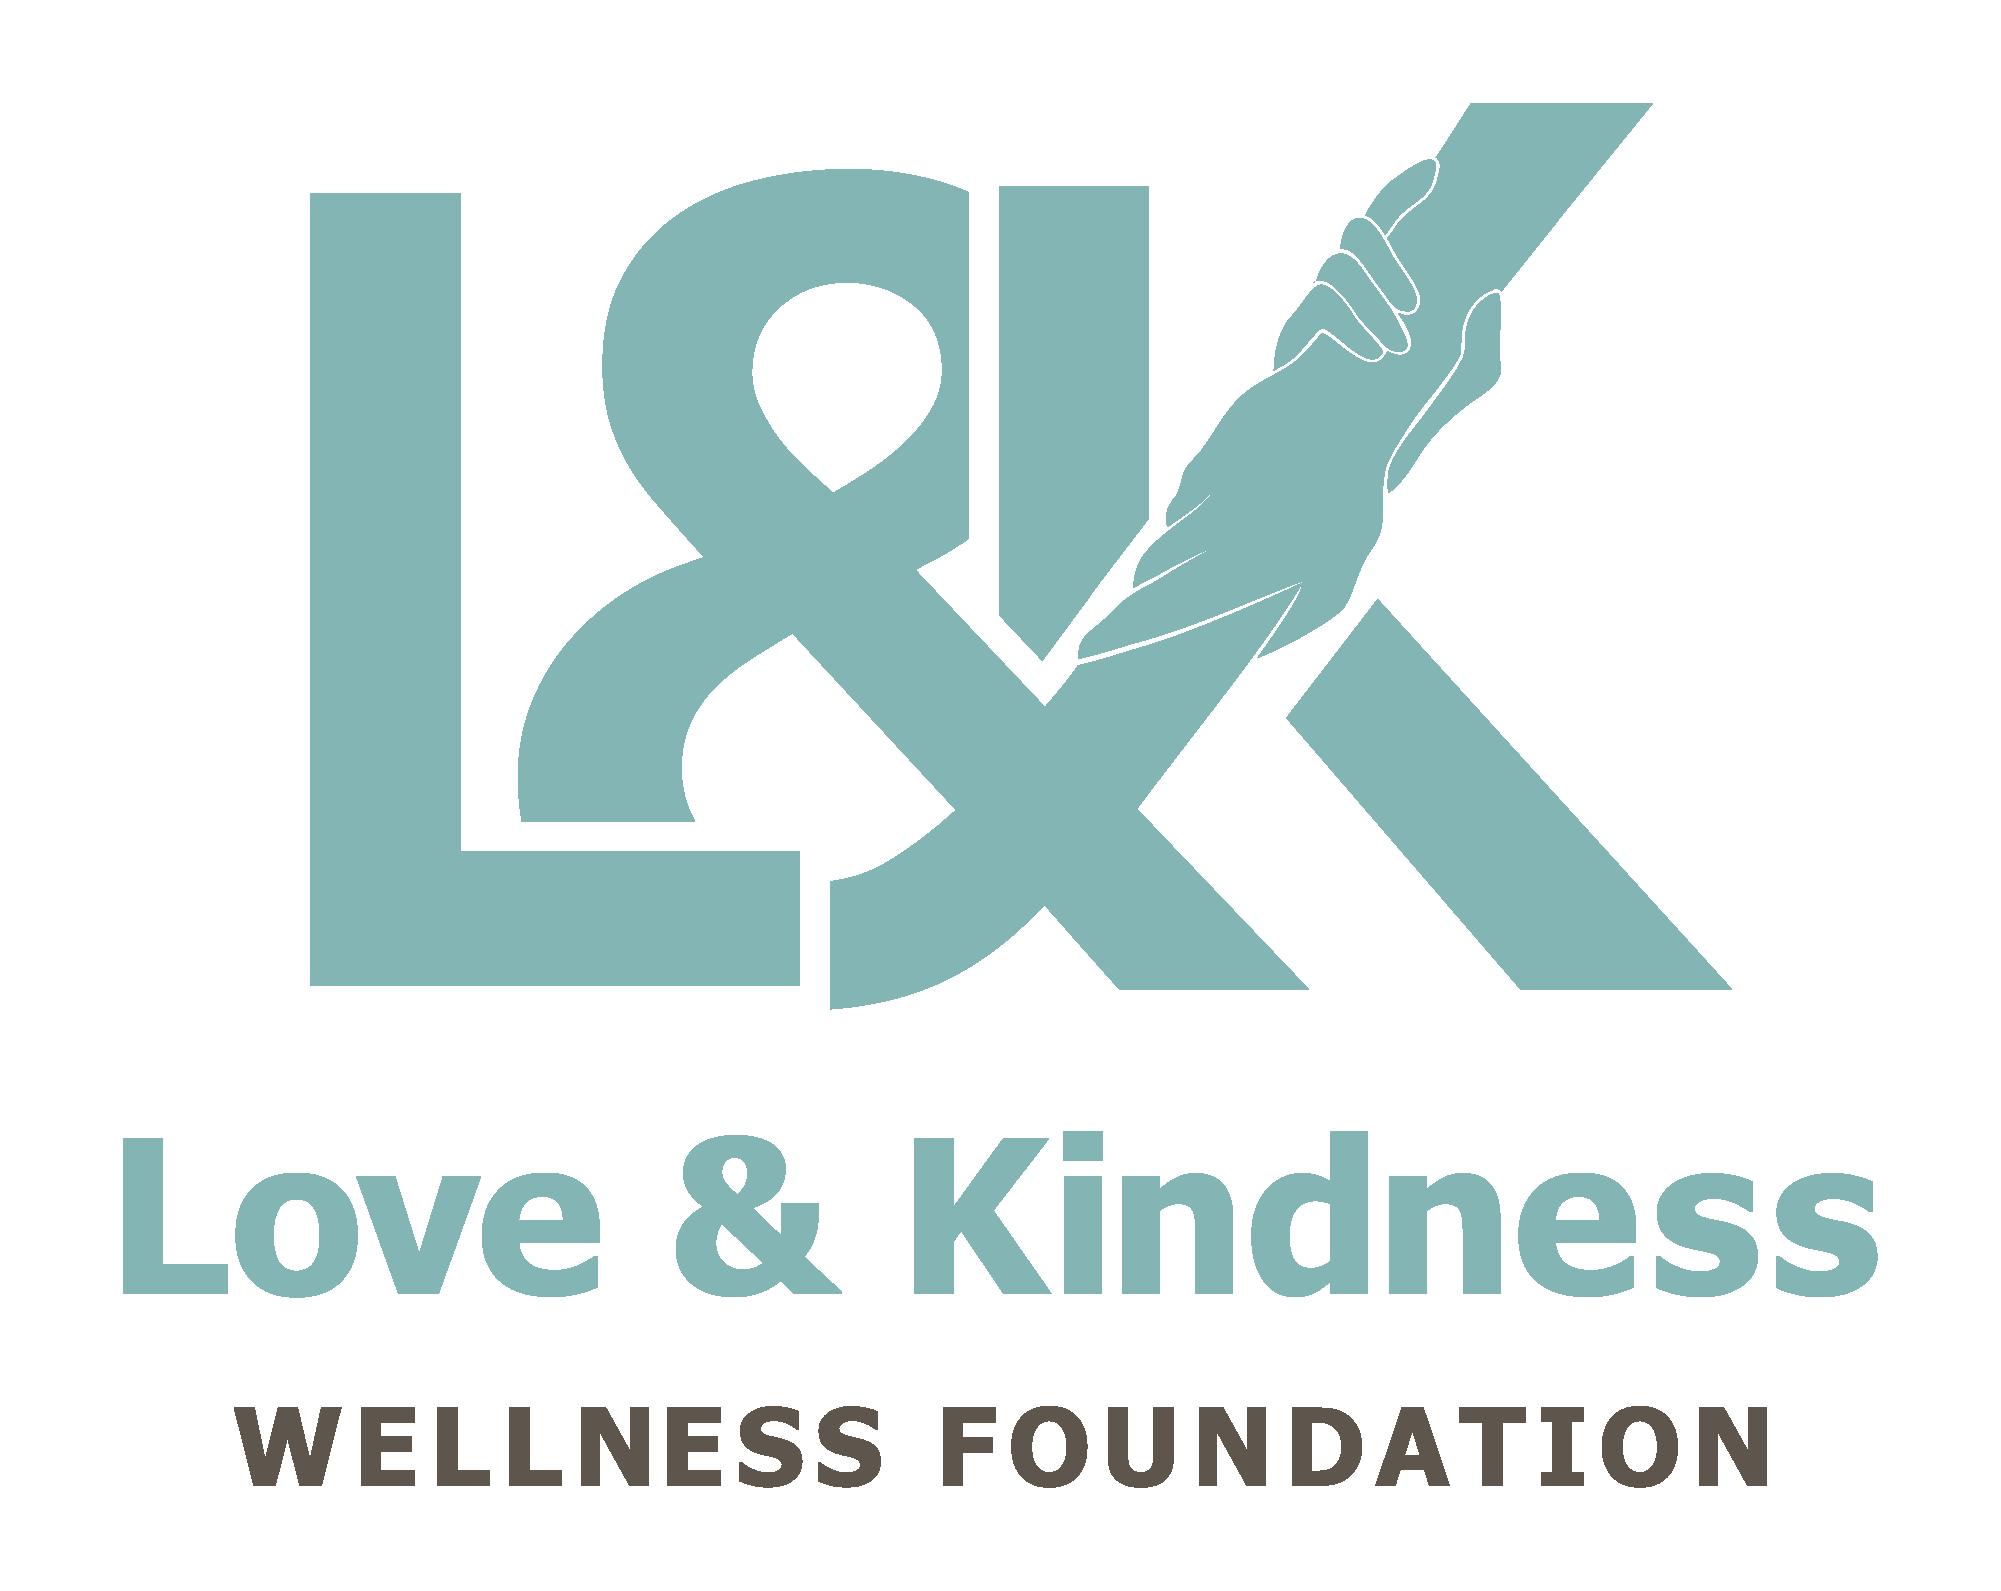 LK Wellness Foundation